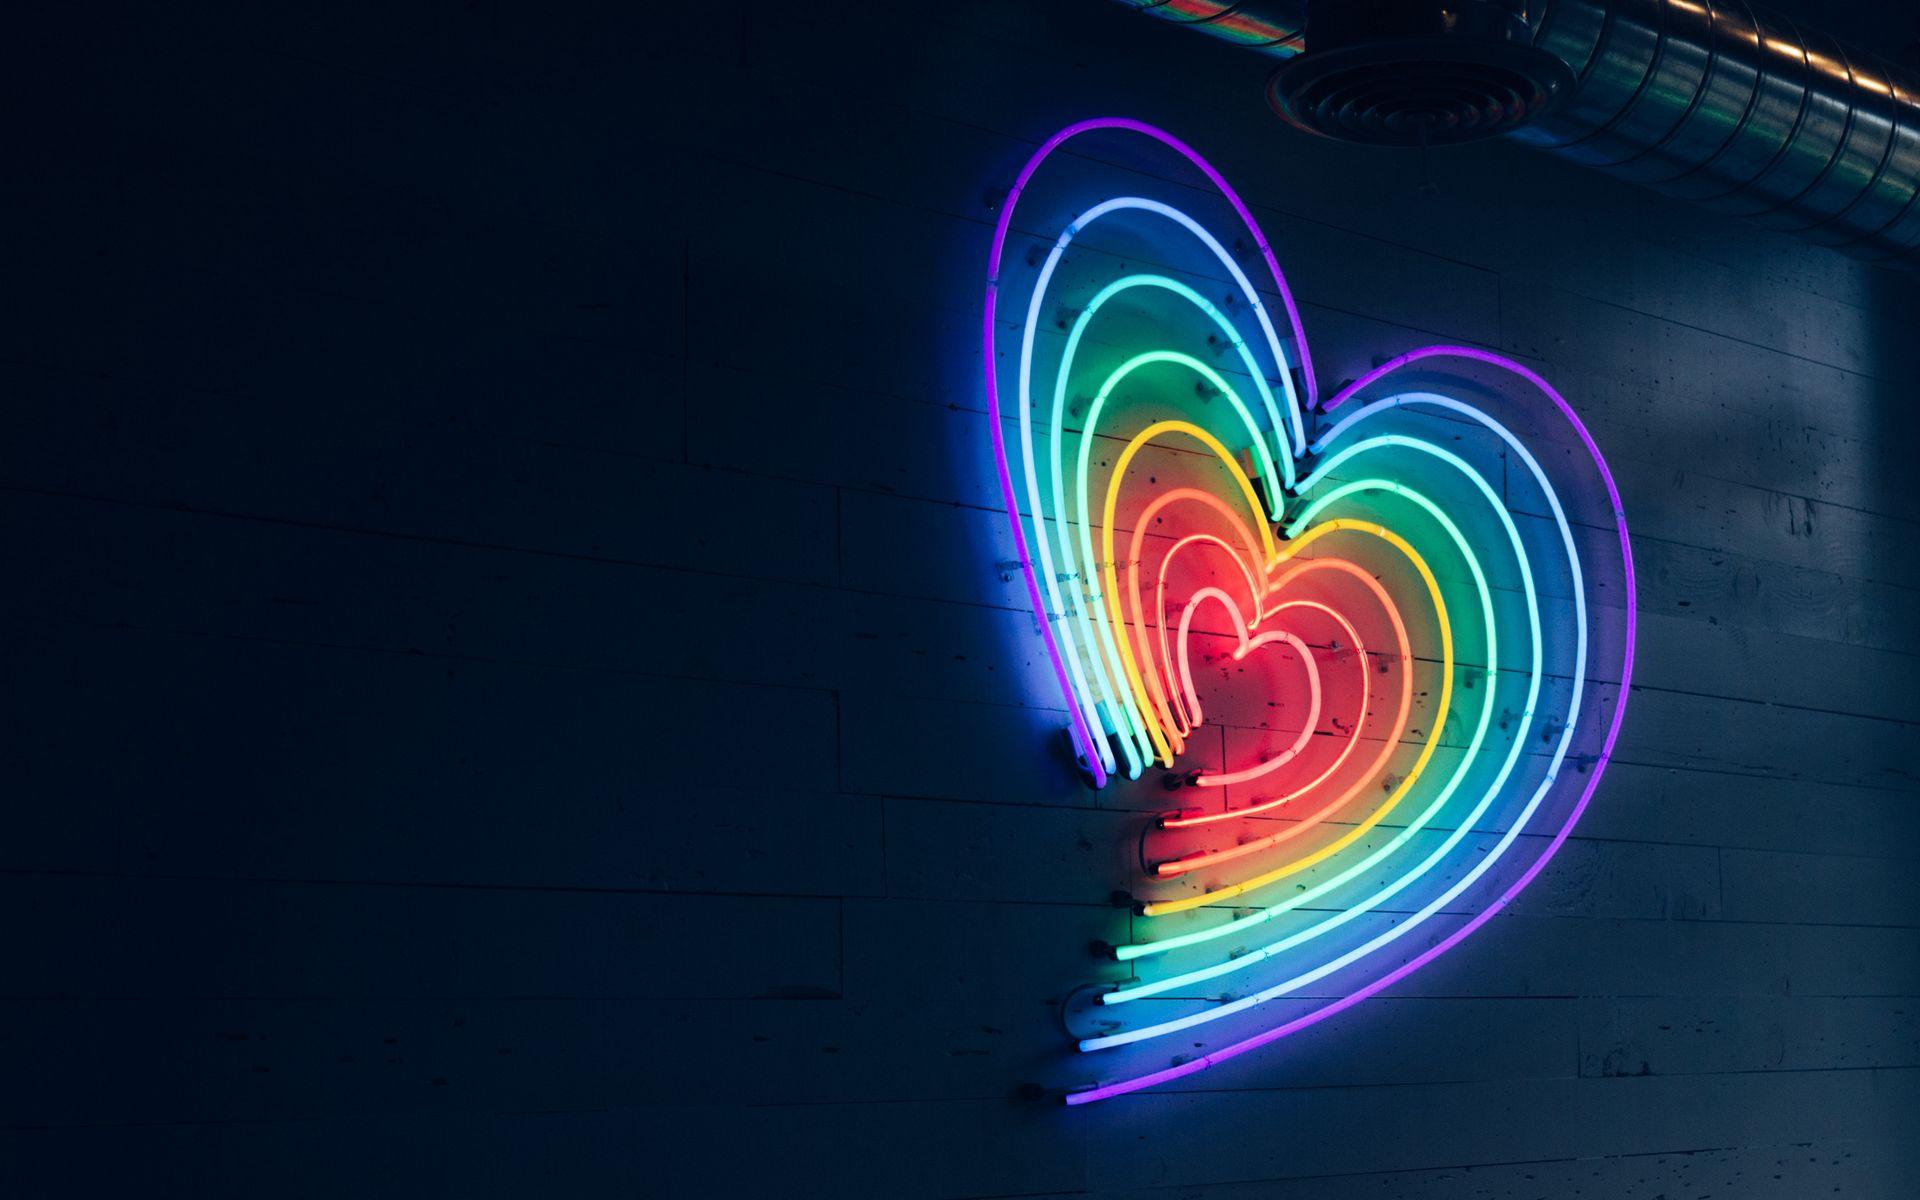 www.heart image.com